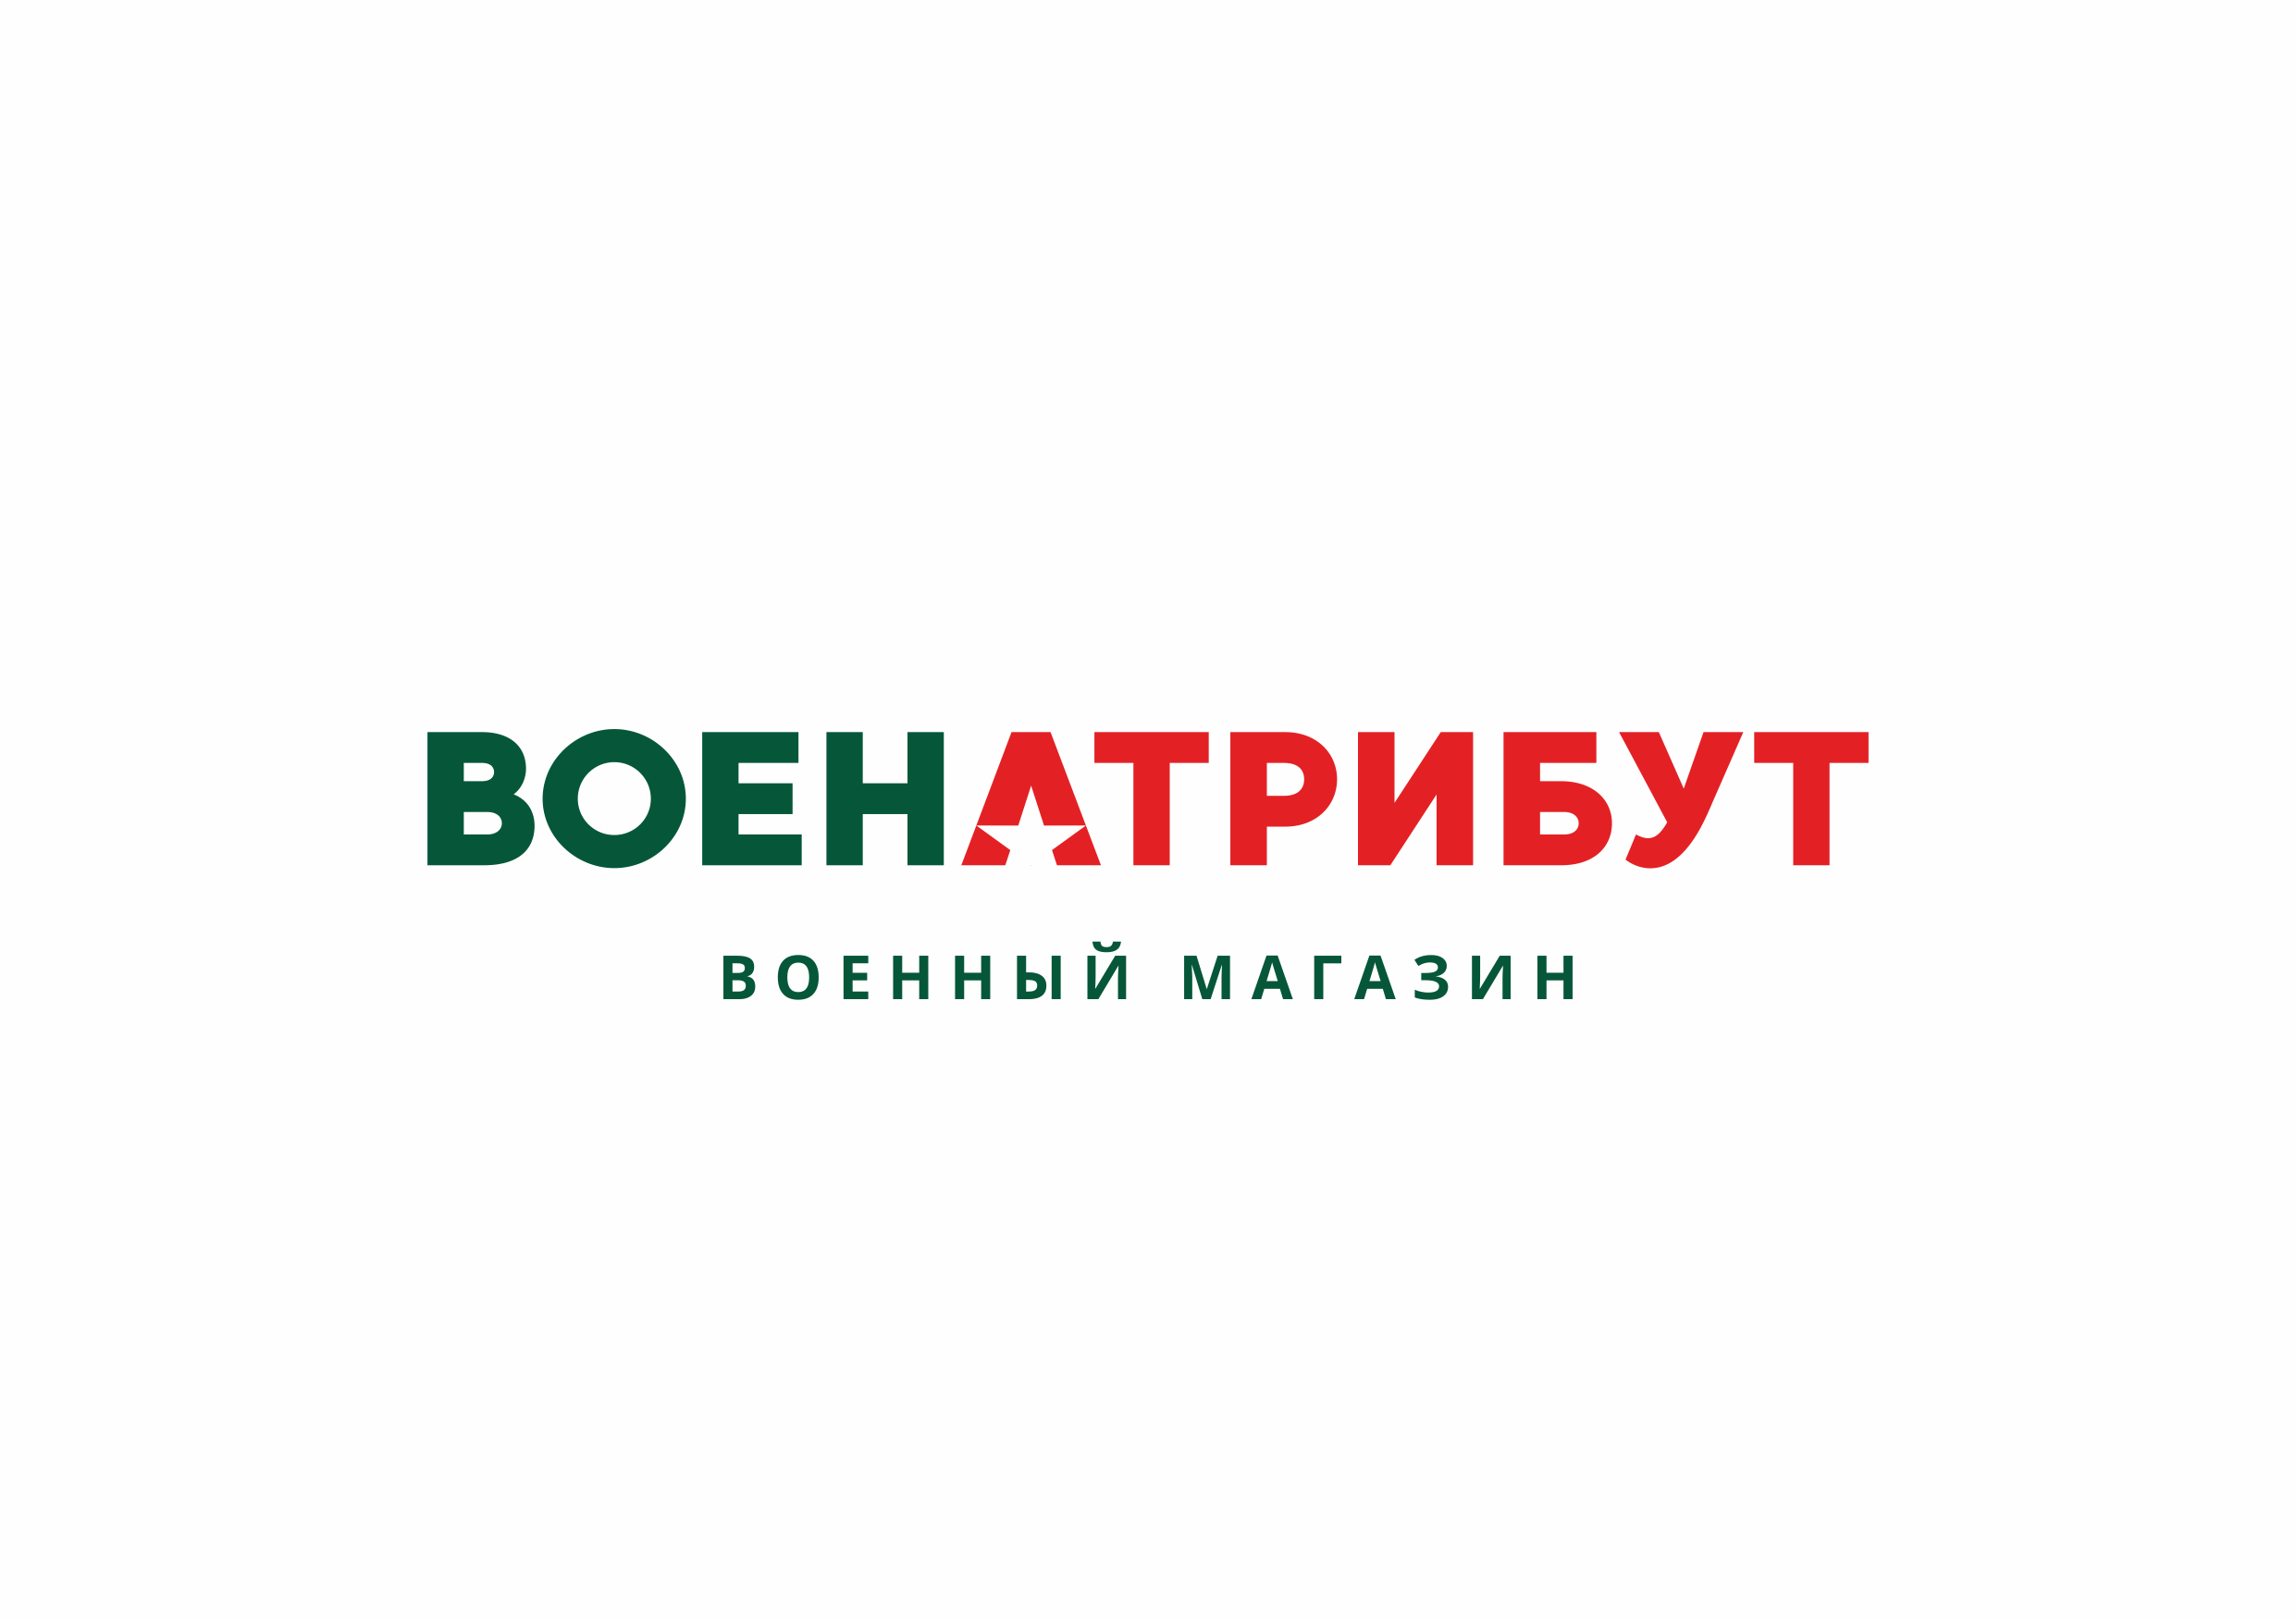 Разработка логотипа для компании военной тематики фото f_59160210f7eb52f2.png